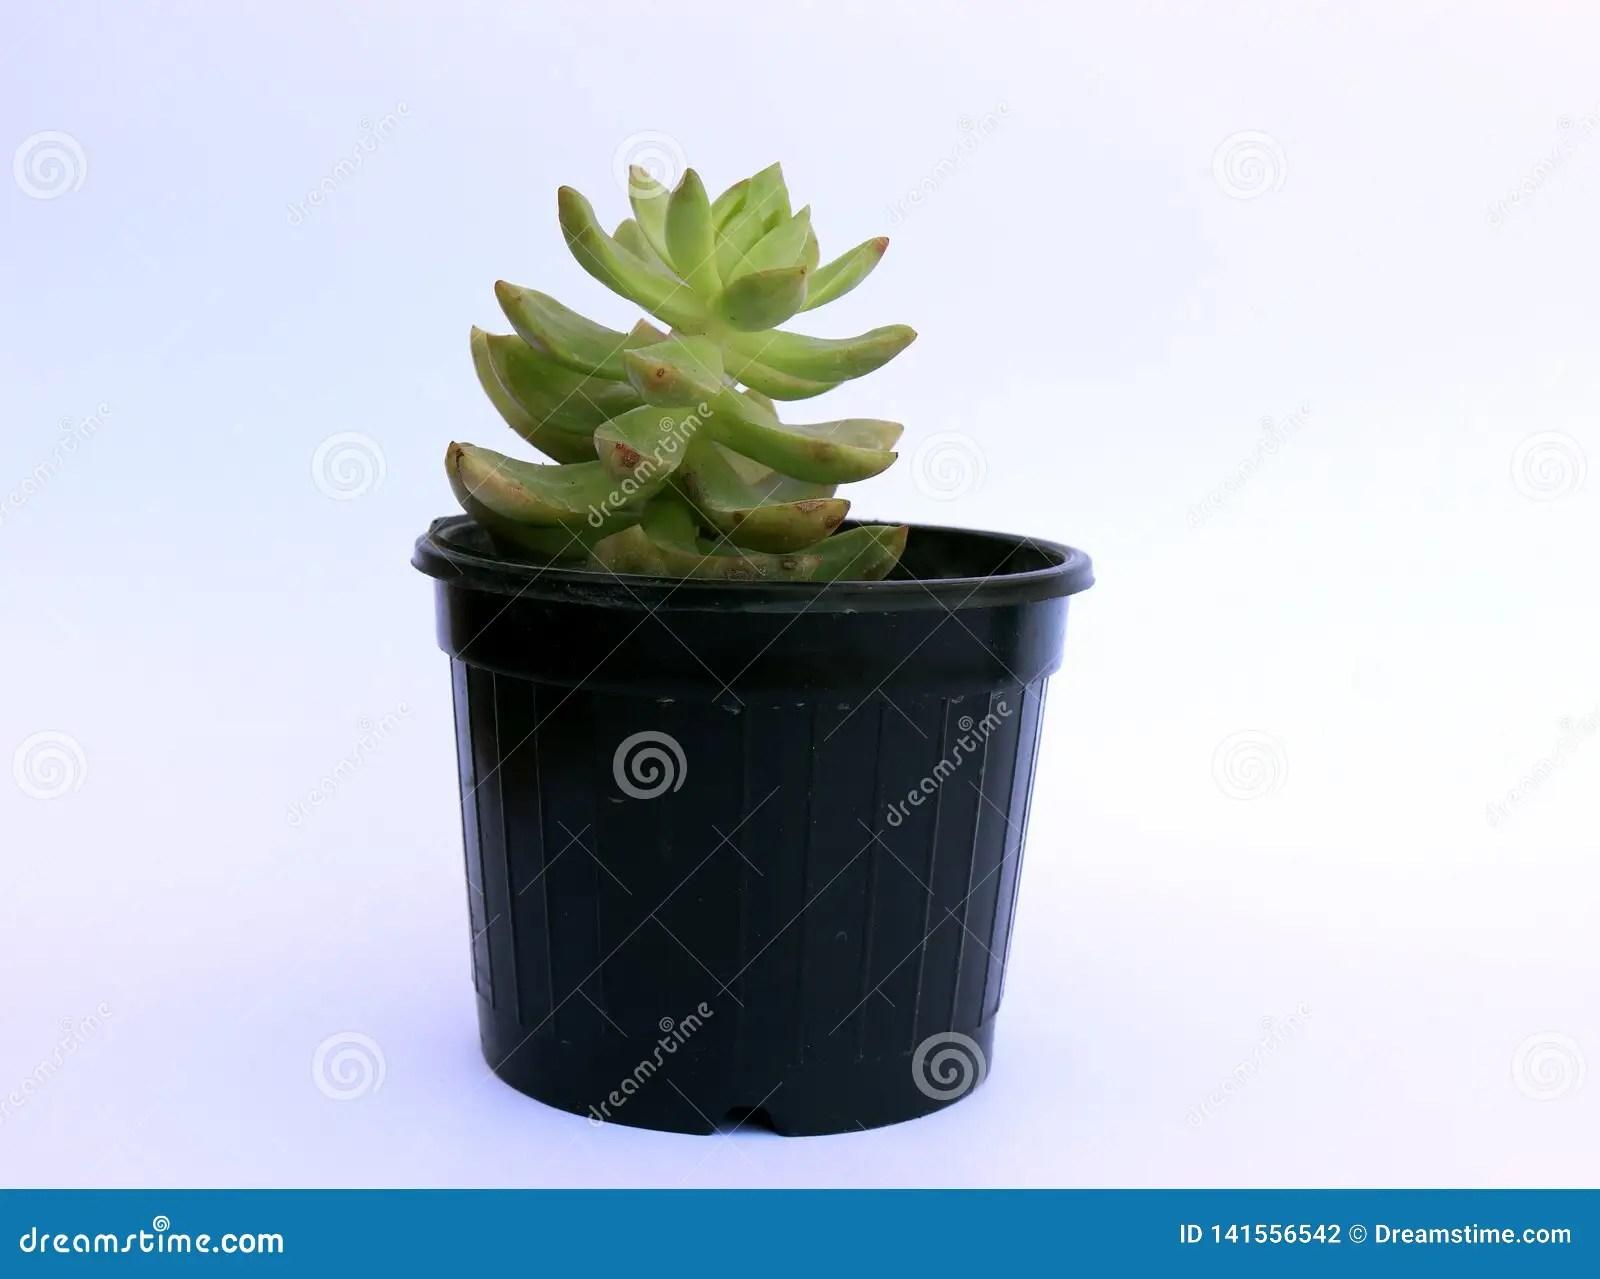 Indoor Flower Pot Decorate Your House Stock Photo Image Of Pots Garden 141556542